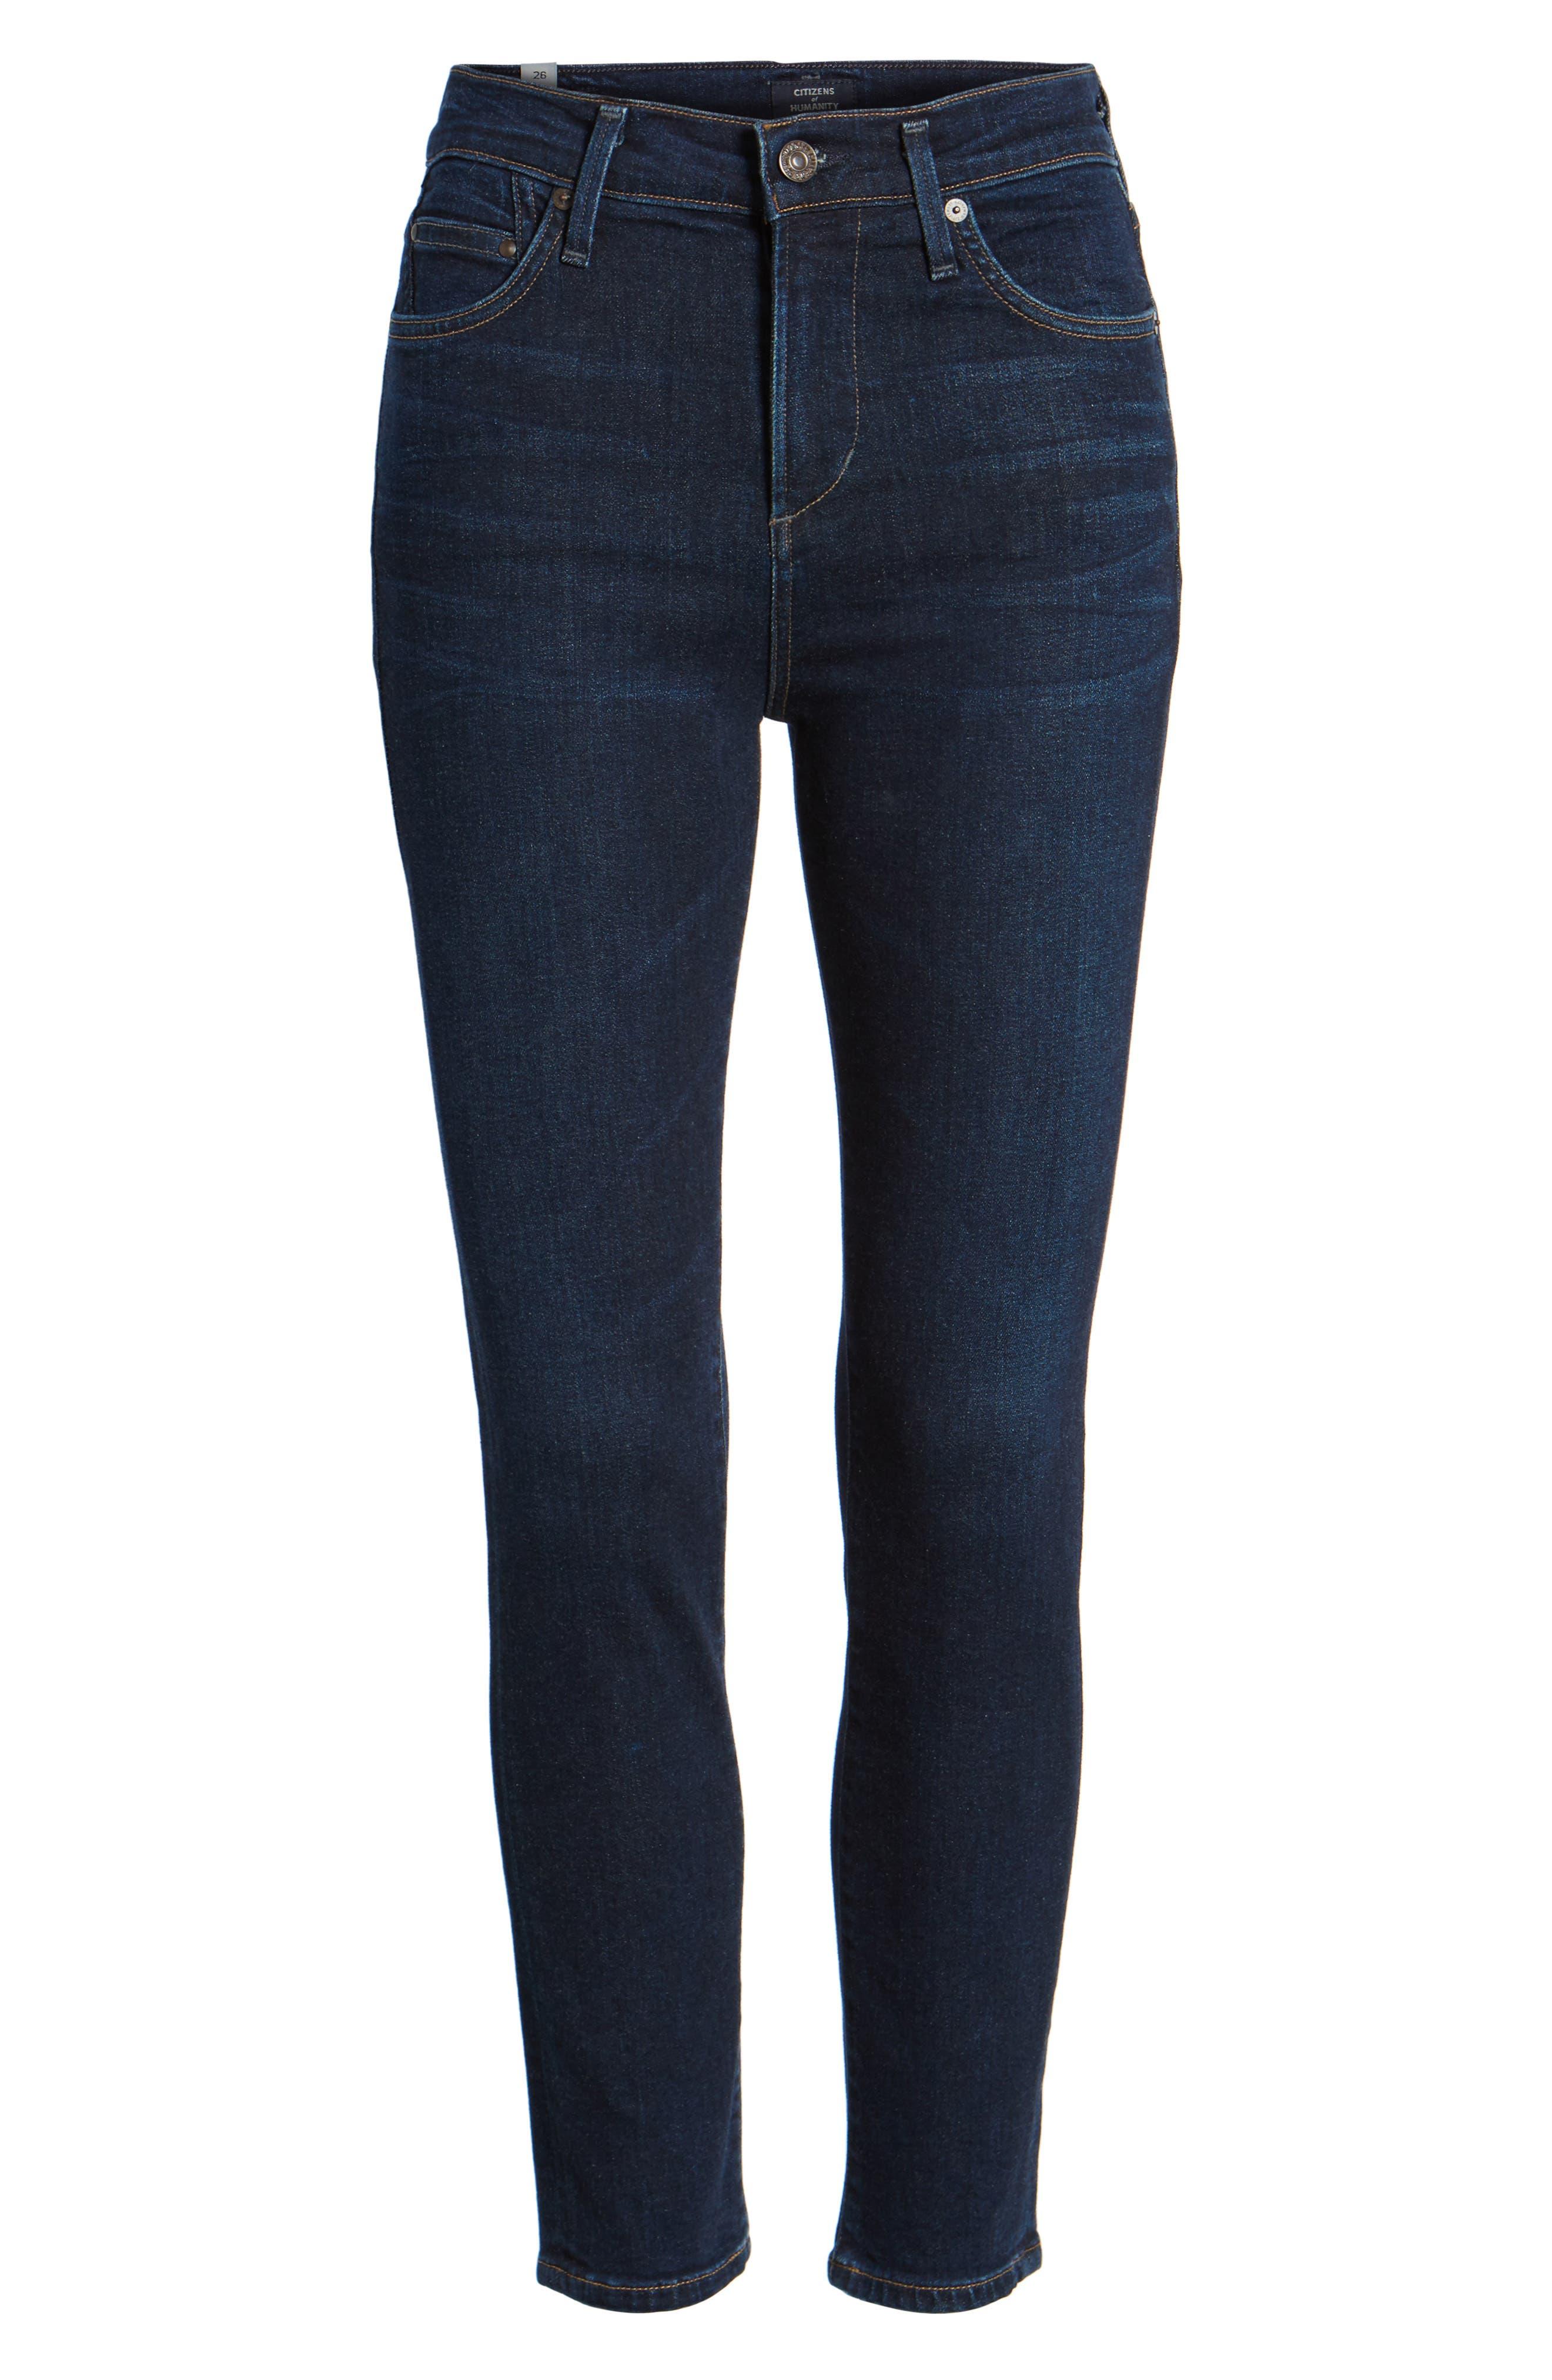 Rocket High Waist Crop Skinny Jeans,                             Alternate thumbnail 7, color,                             484